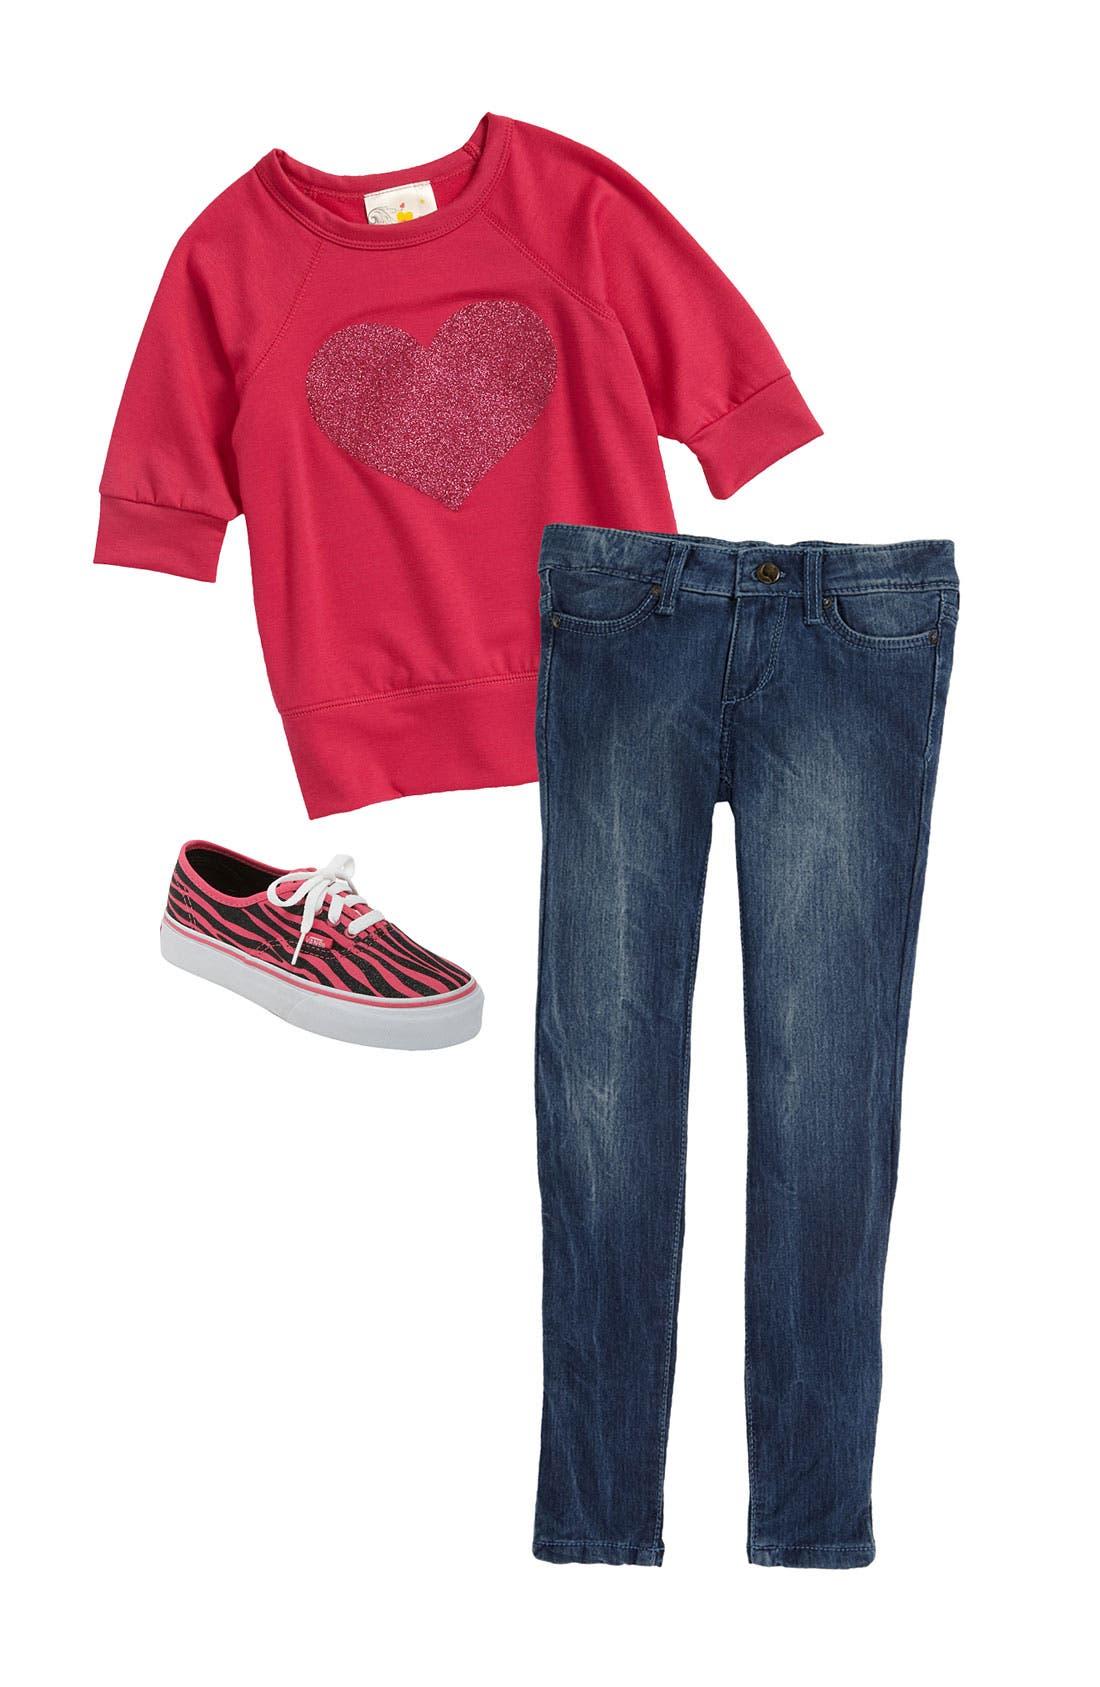 Alternate Image 1 Selected - Jenna & Jessie Sweater & Joe's Jeans (Little Girls)